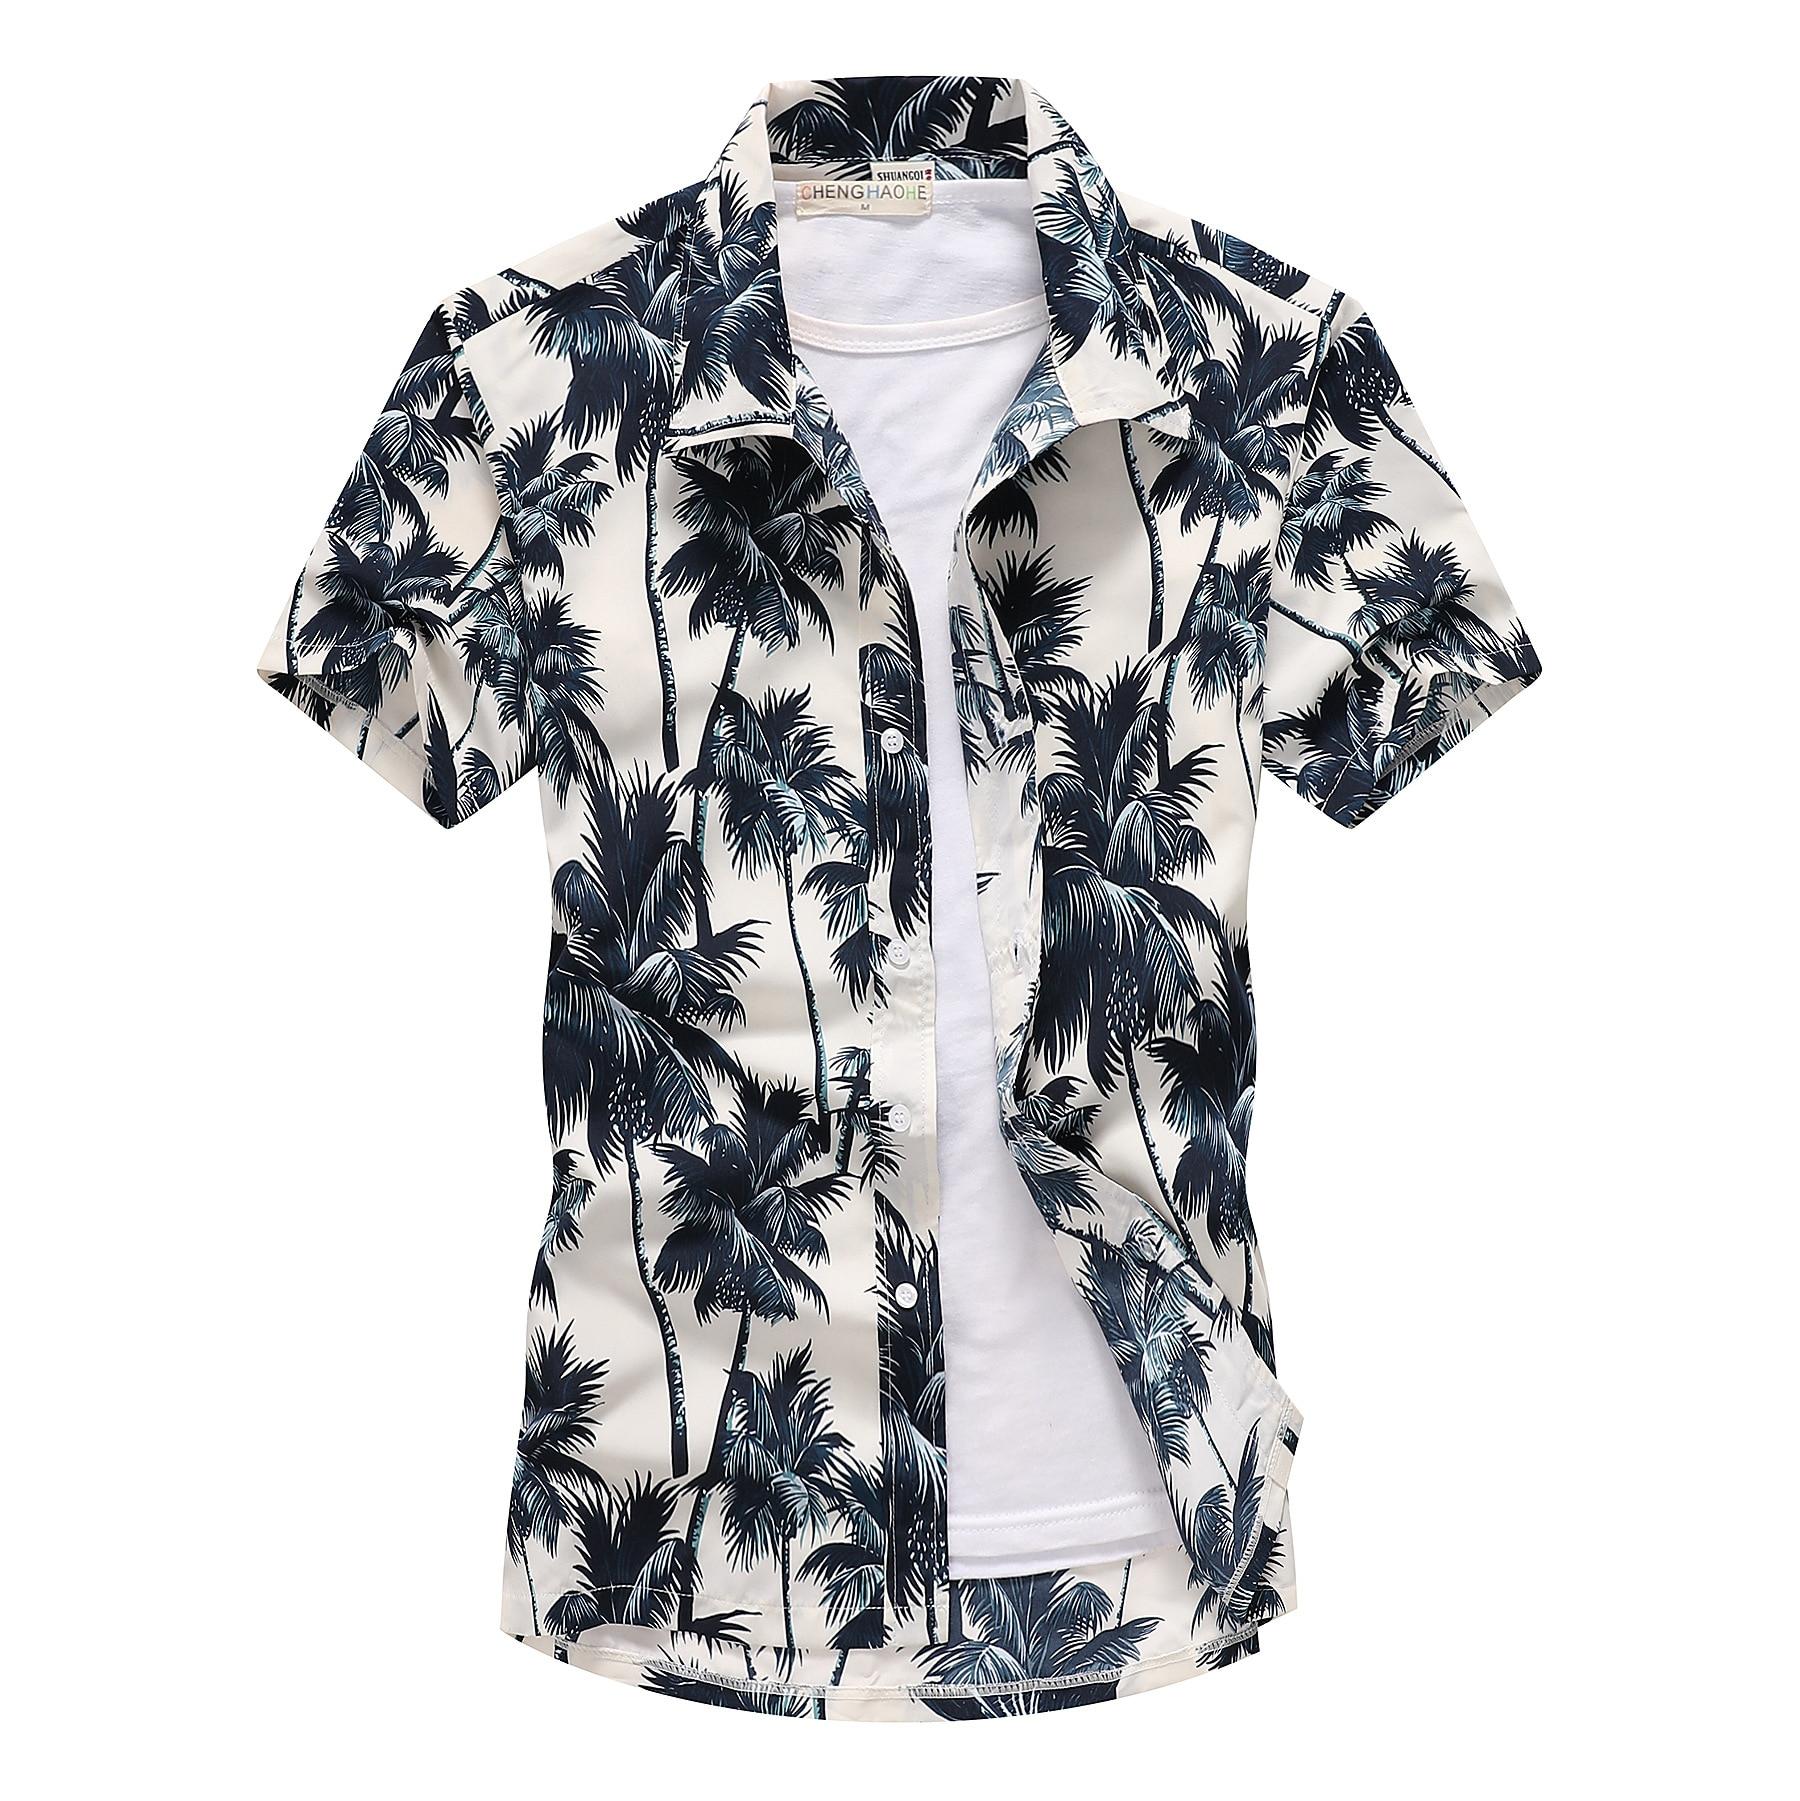 Beach Shirts 2019 Summer Fashion Camisa Masculina Coconut Tree Printed Short Sleeve Button Down Hawaiian Shirts Mens Plus Size